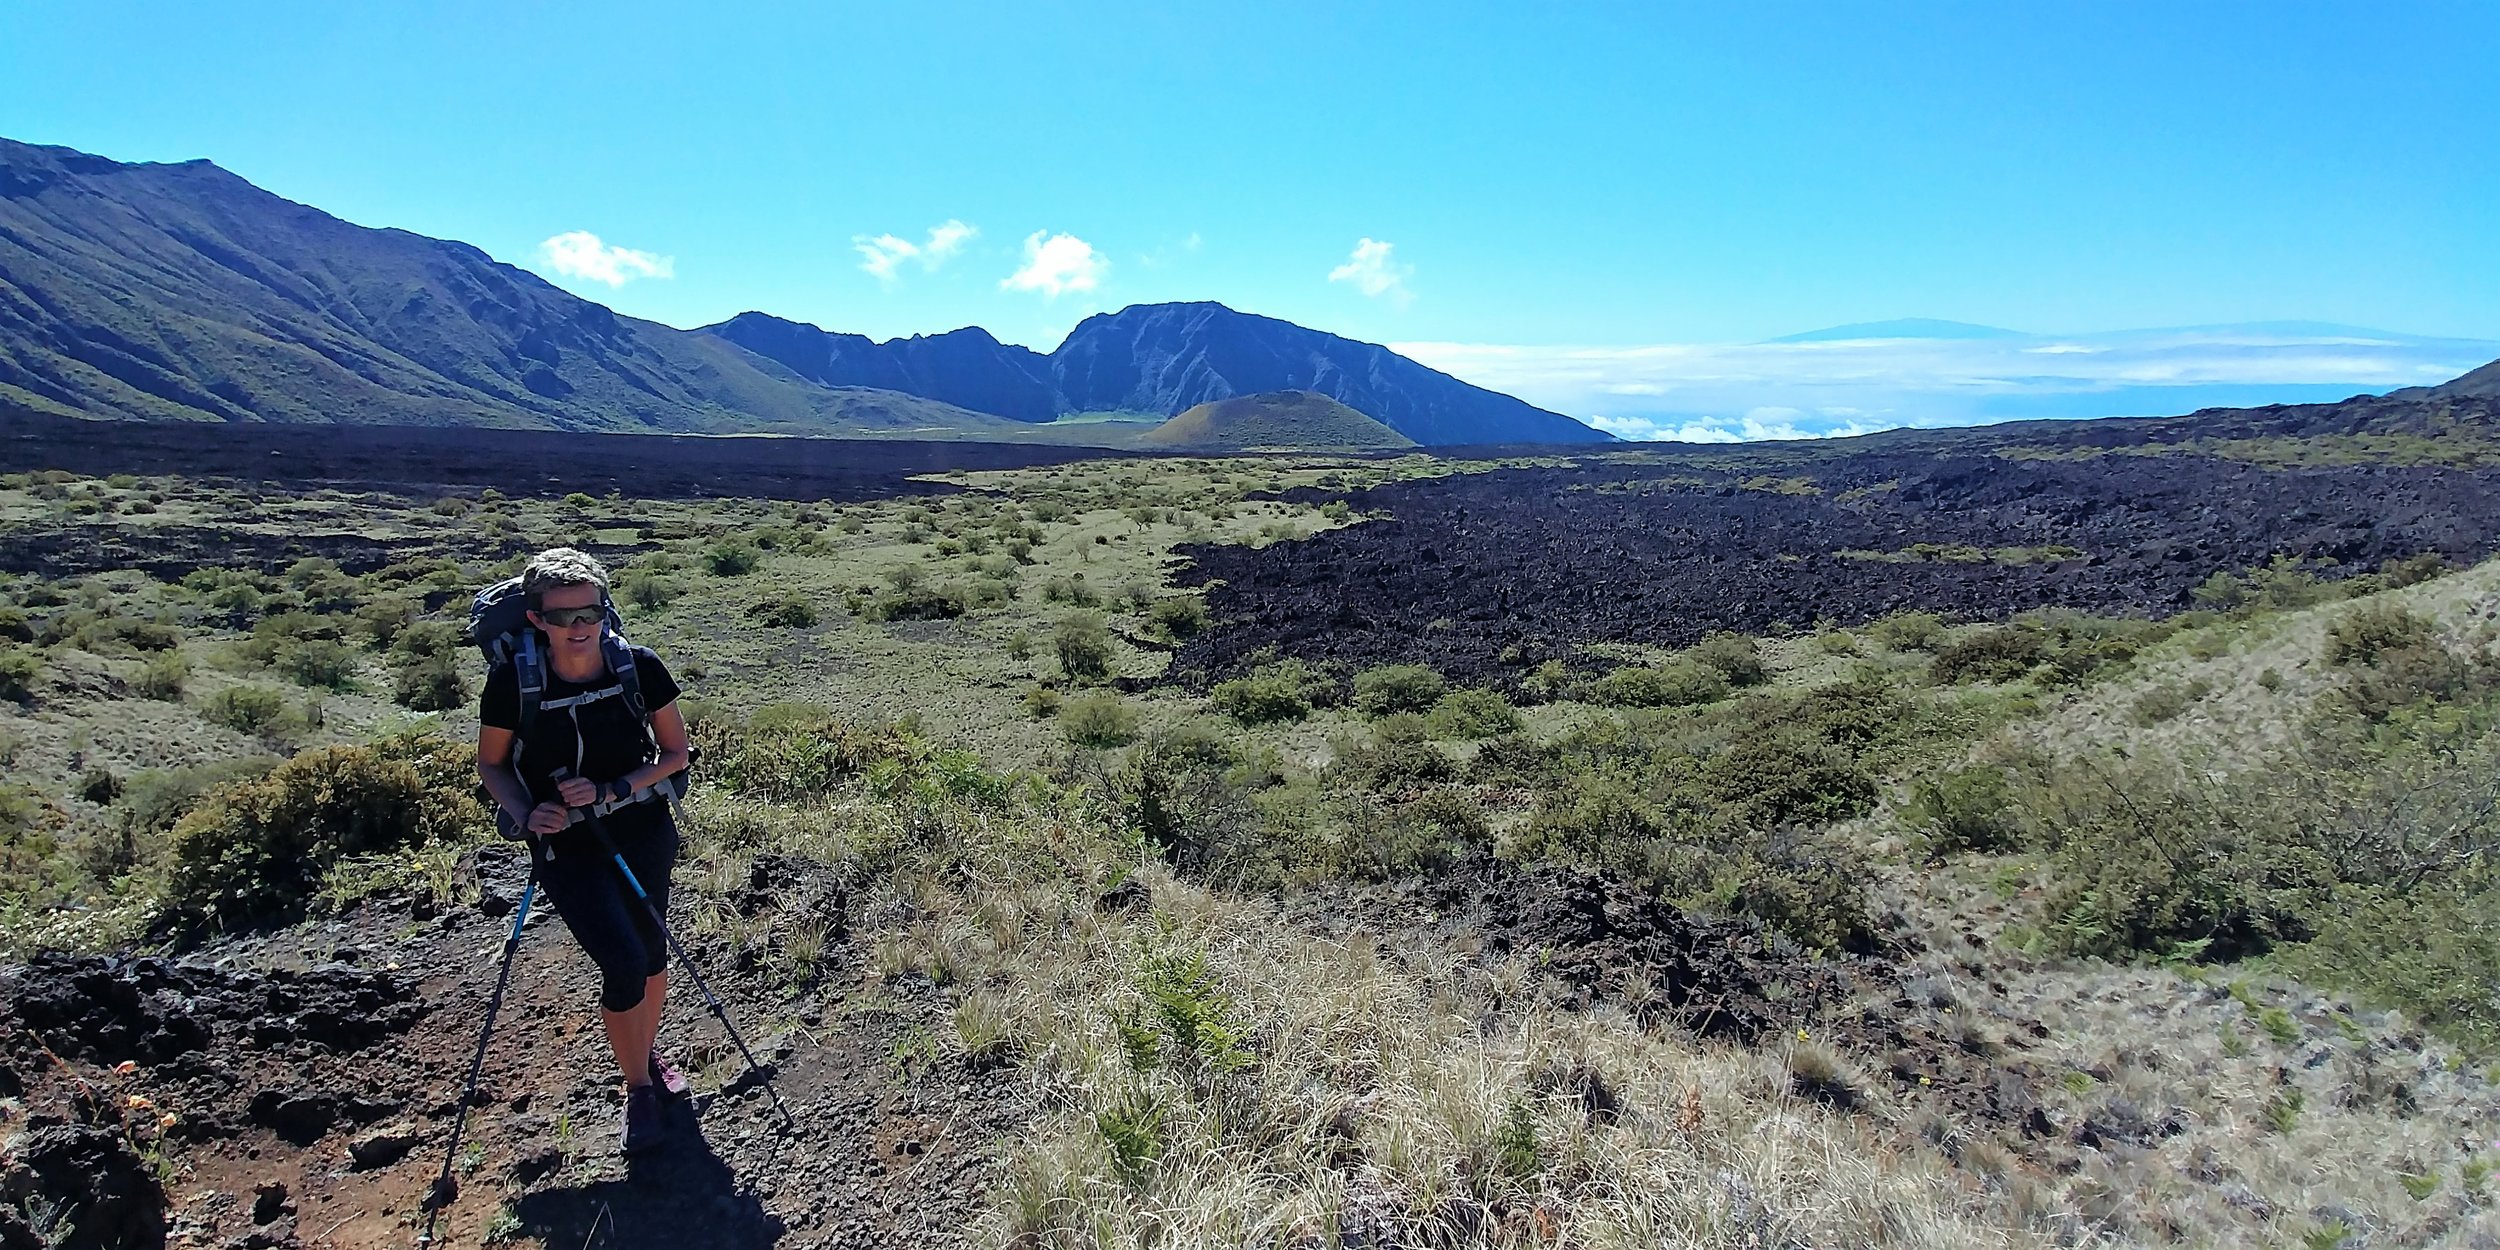 Mauna Kea und Mauna Loa im Hintergrund